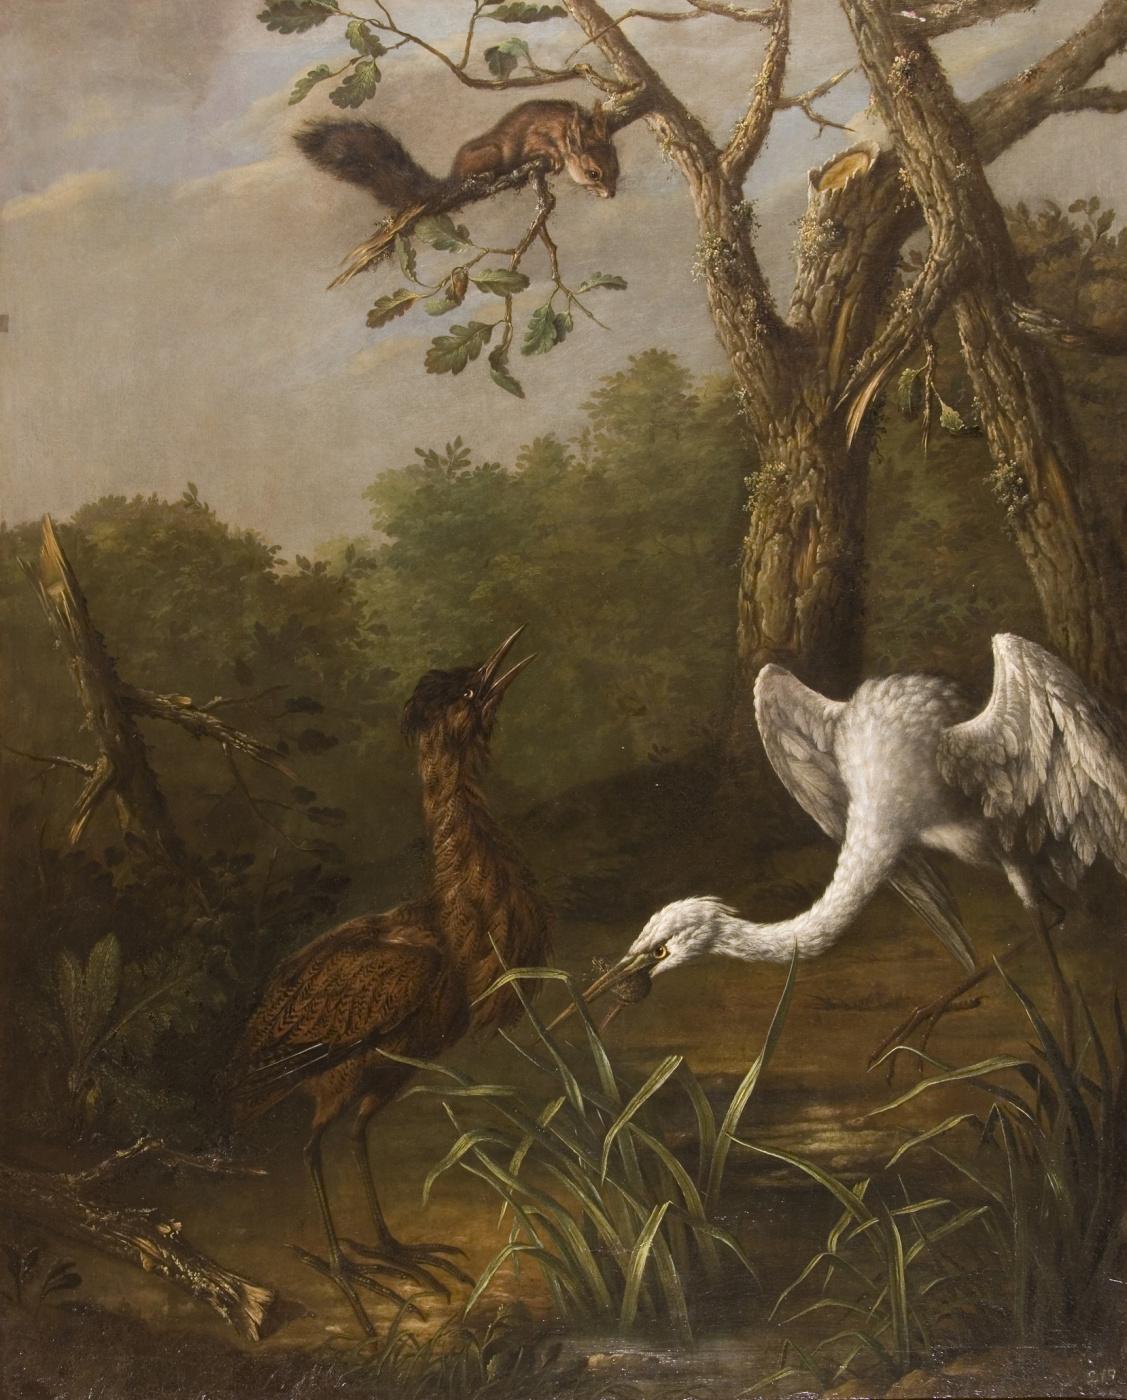 Johann (Ivan Fedorovich) Friedrich Groot. The area of the swamp